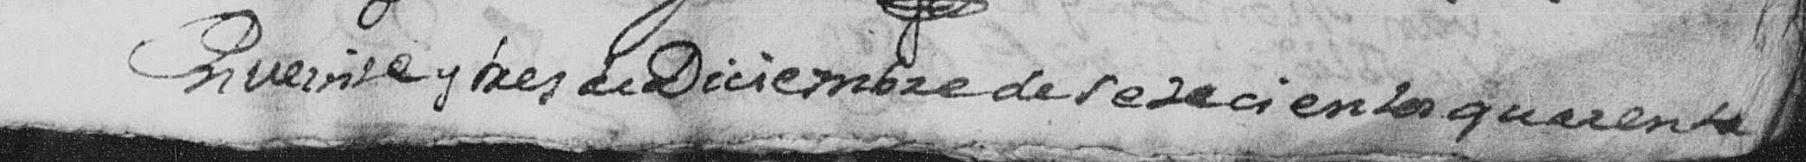 Juana Maria Eusebia Moya 1742 mOnterrey Pg 219